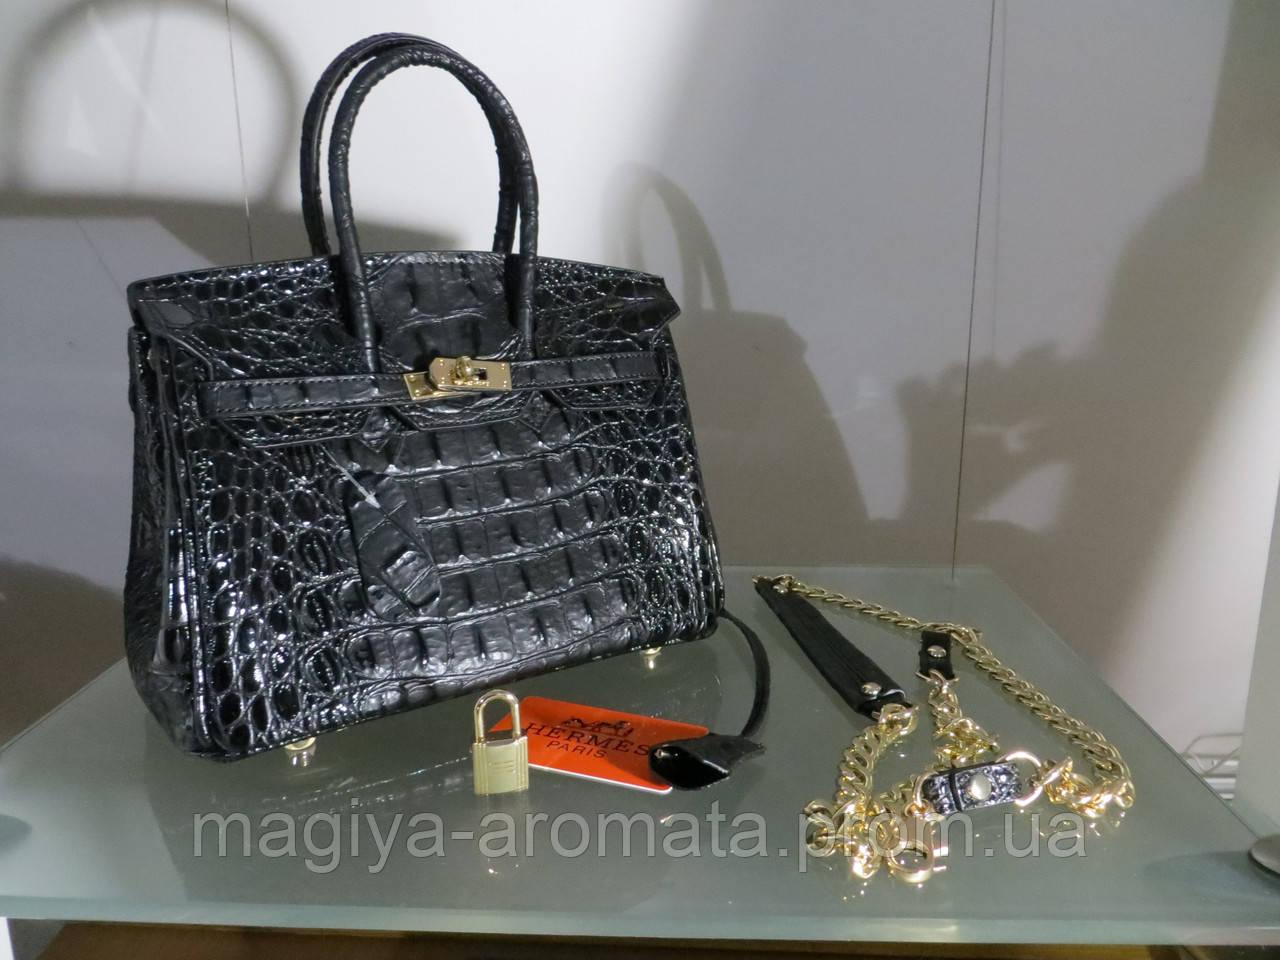 7c0c1ddc2f2d Женская сумка Hermes Биркин черная 20см Original quality - Магия Аромата -  Парфюмерия, Брендовые Сумки